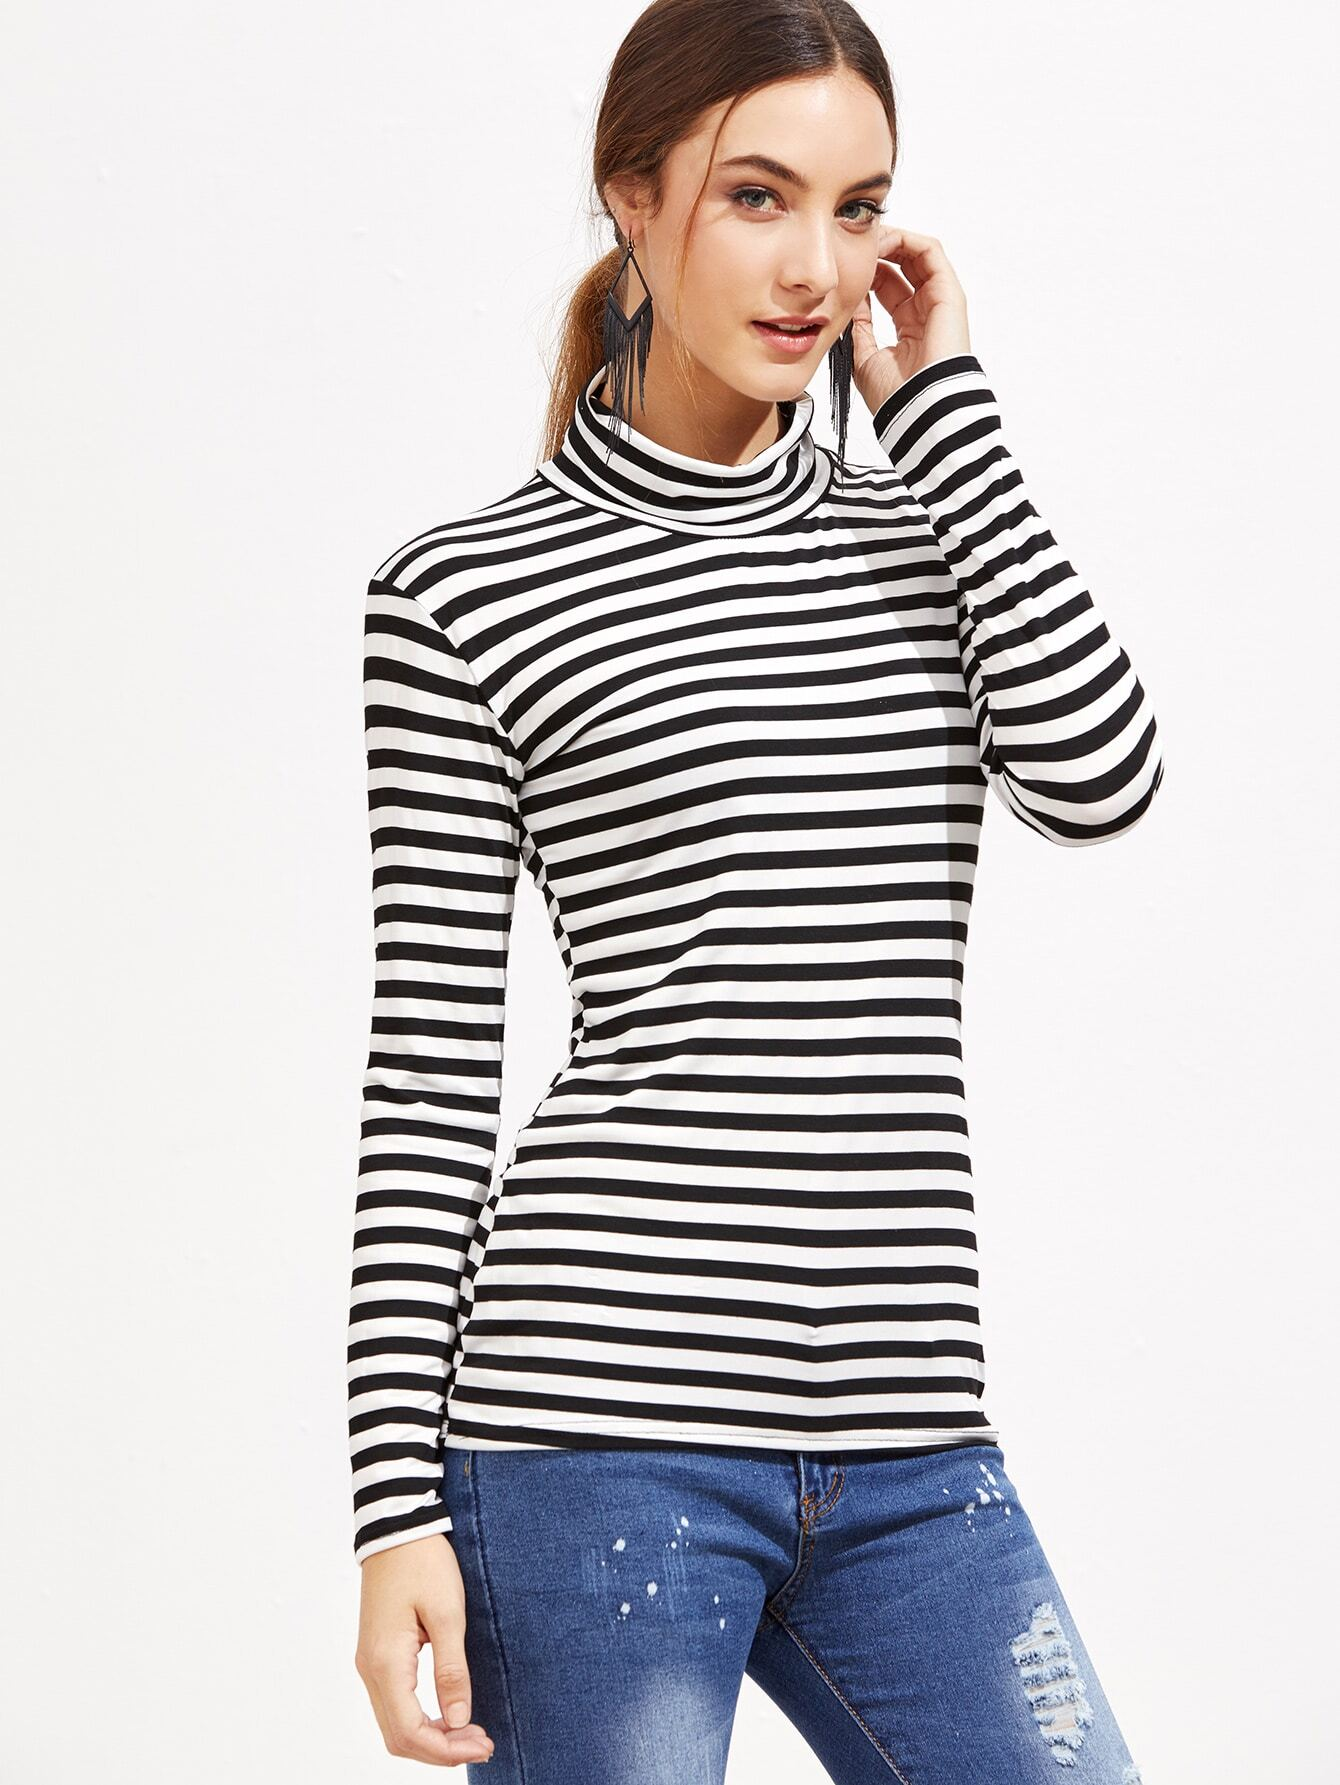 32b1a9b45 Black And White Striped High Neck T-Shirt EmmaCloth-Women Fast ...